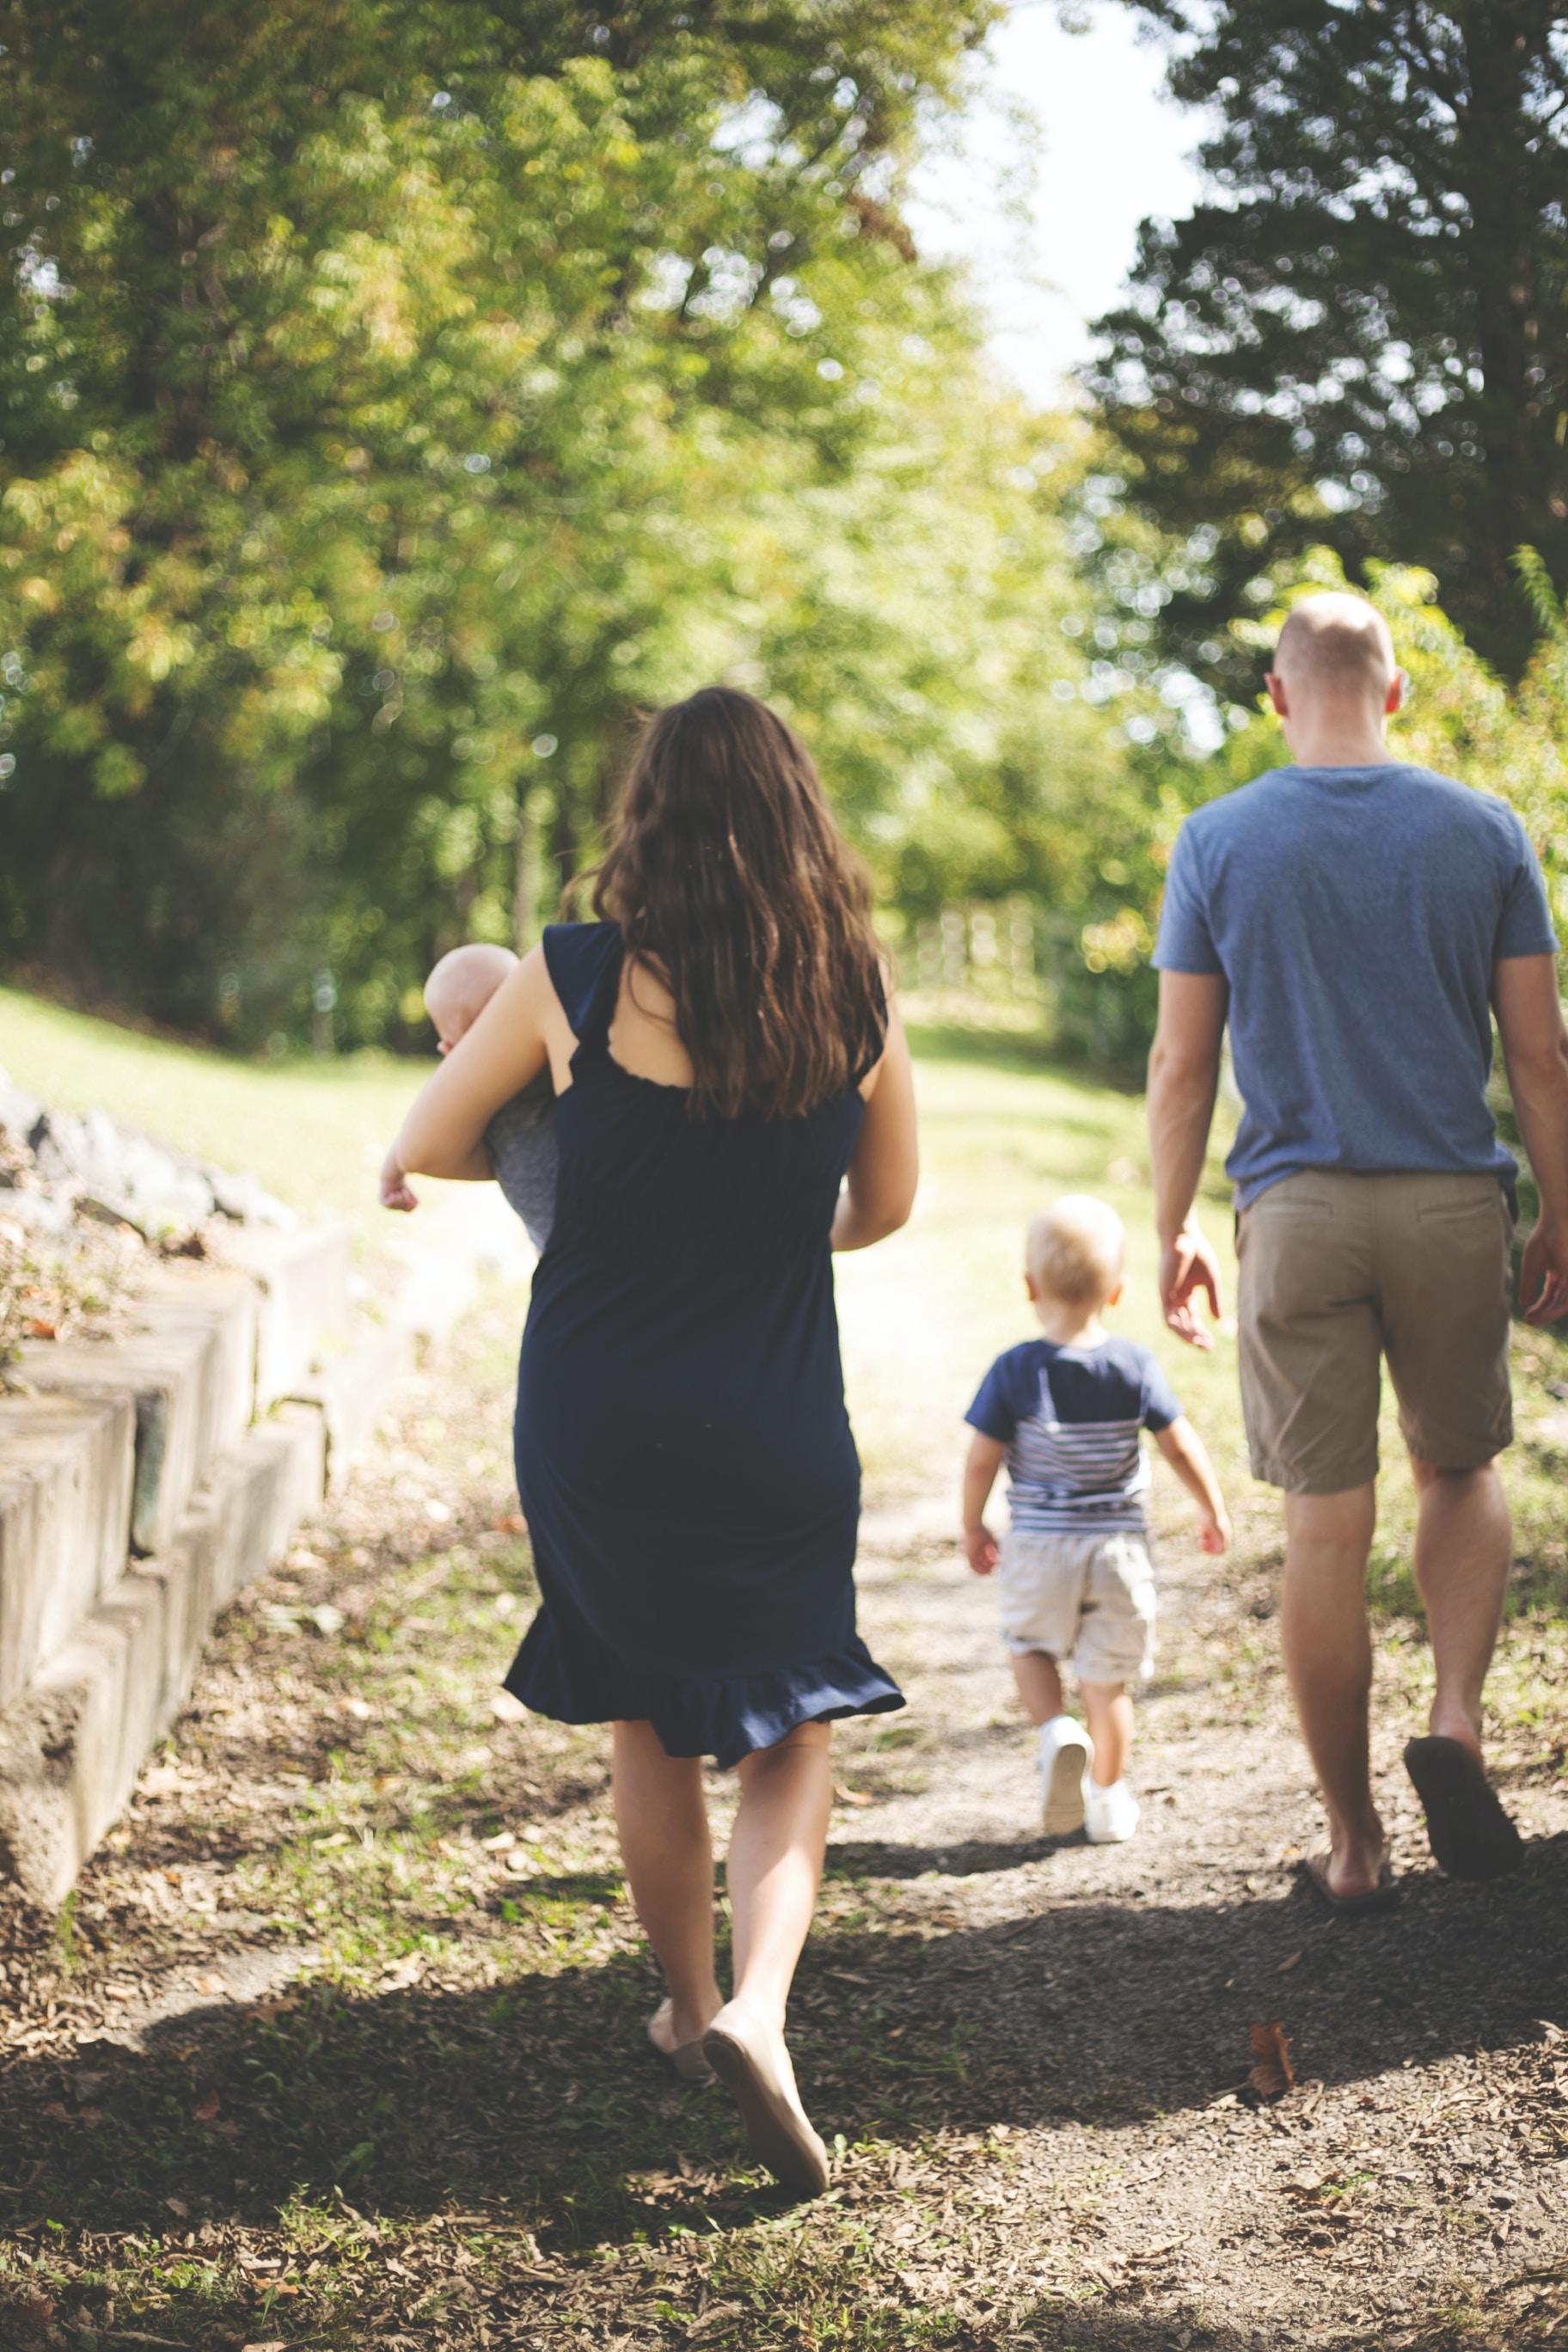 woman carrying baby near man